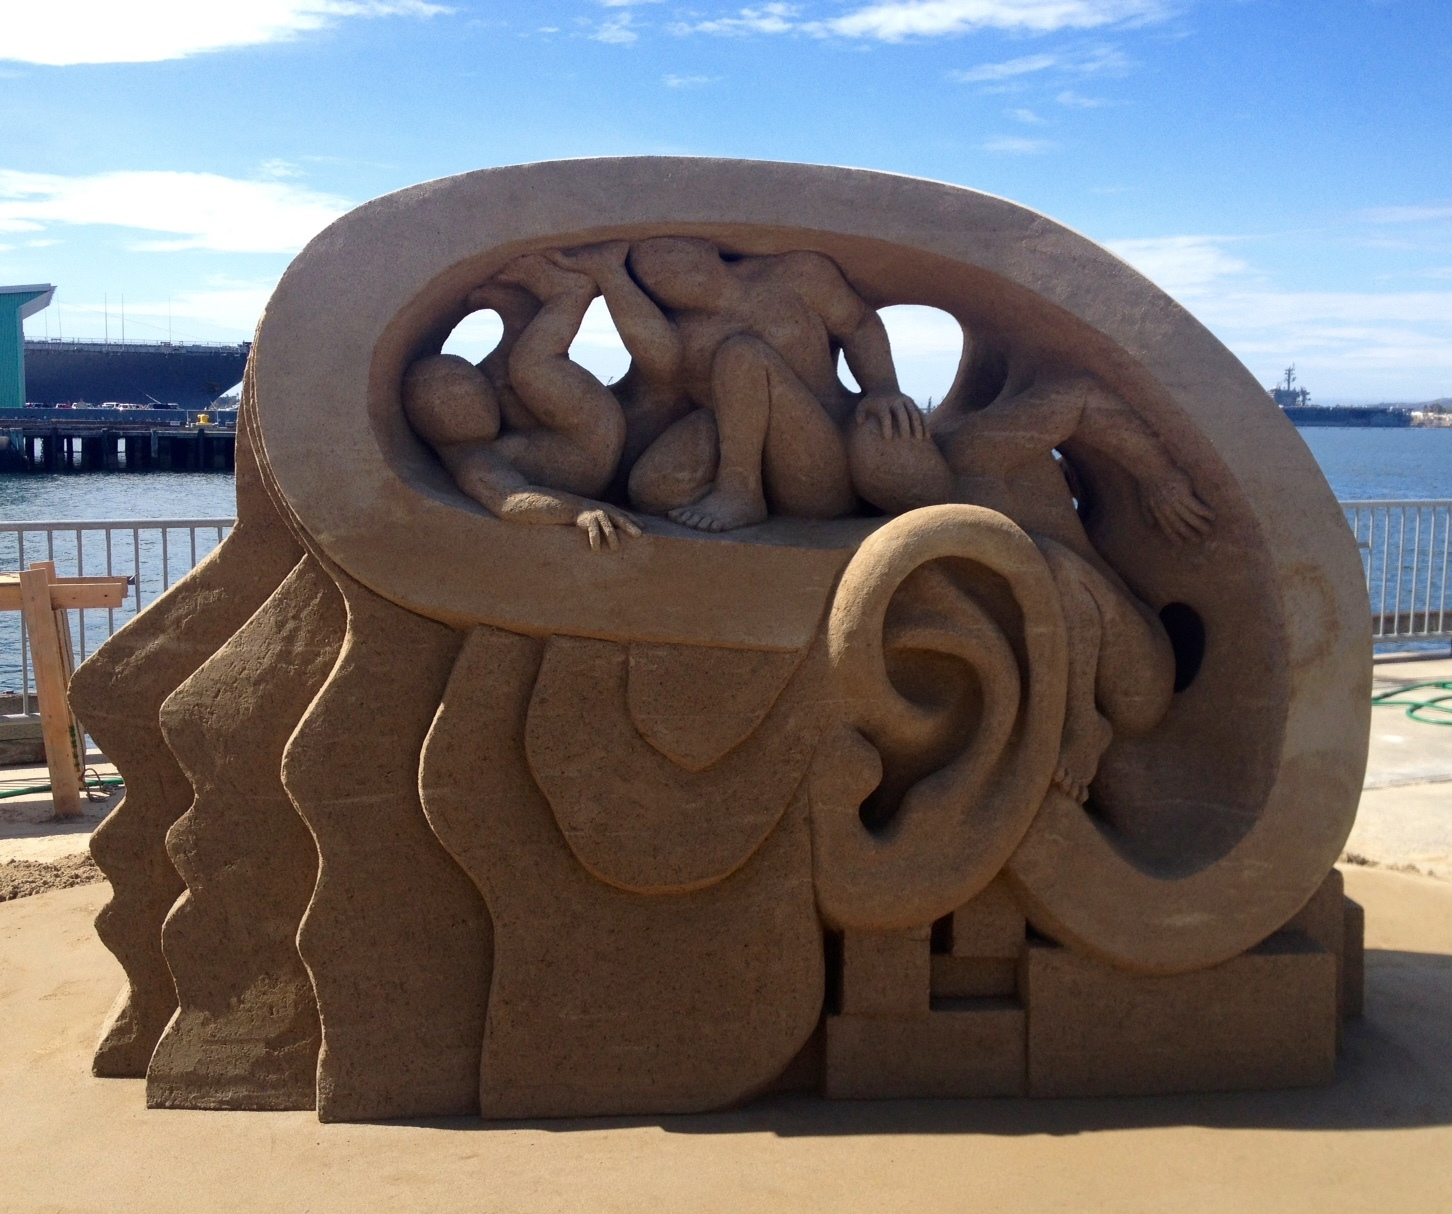 Sand Diego sand sculpture by Rusty Croft